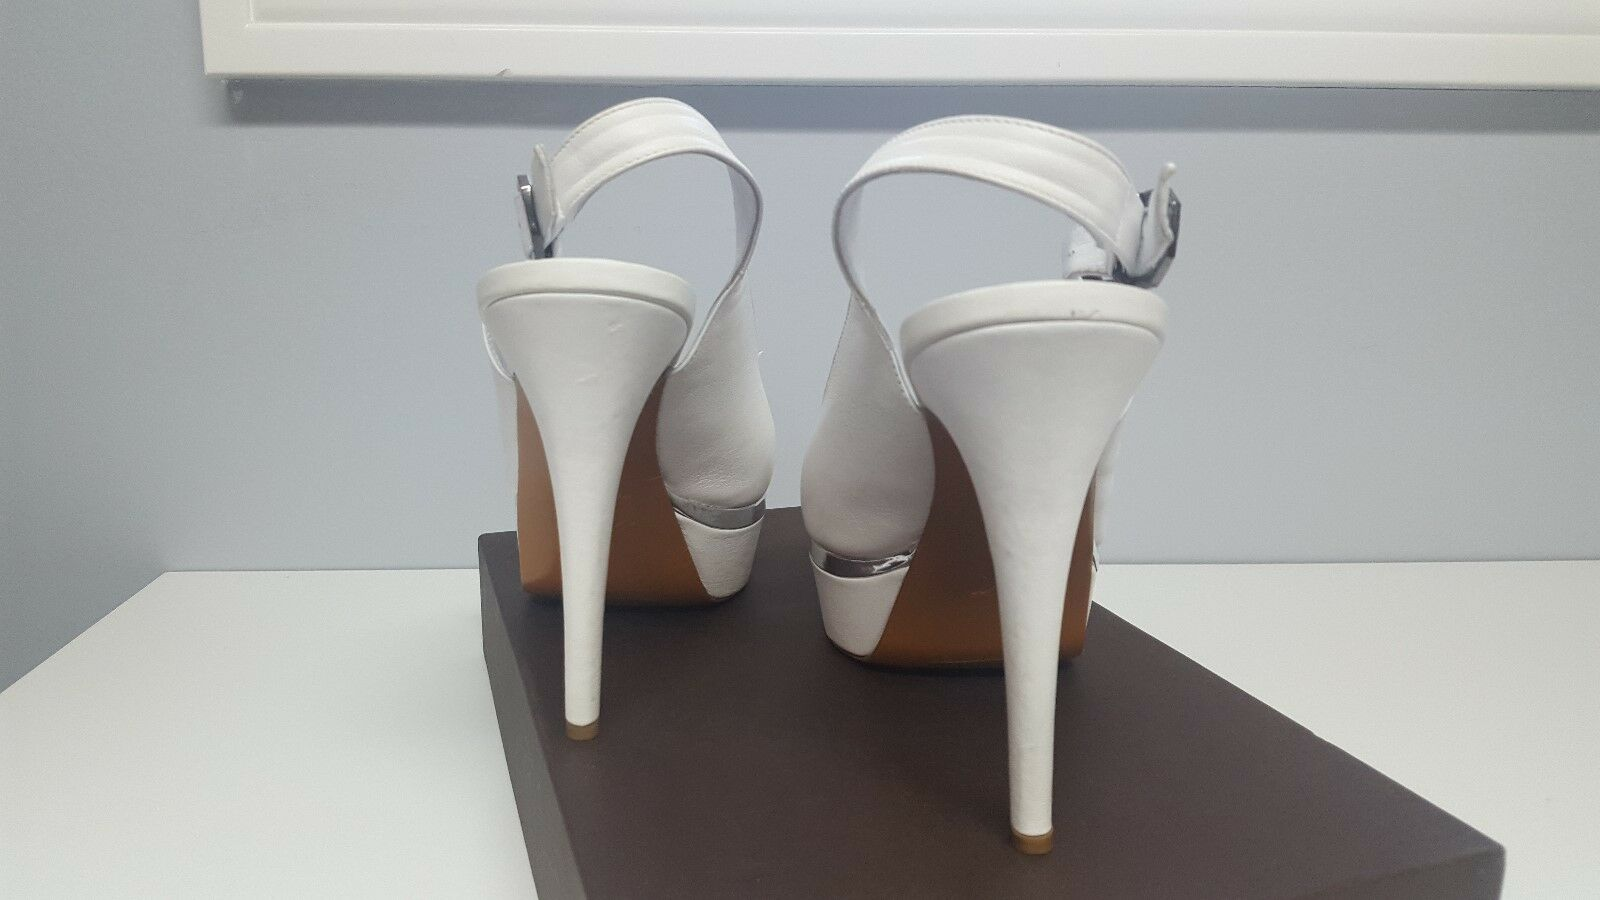 Nando Nando Nando Muzi Leder Weiß Sandales Heels Italian Designer EU 38.5 US 8.5 80f6e2